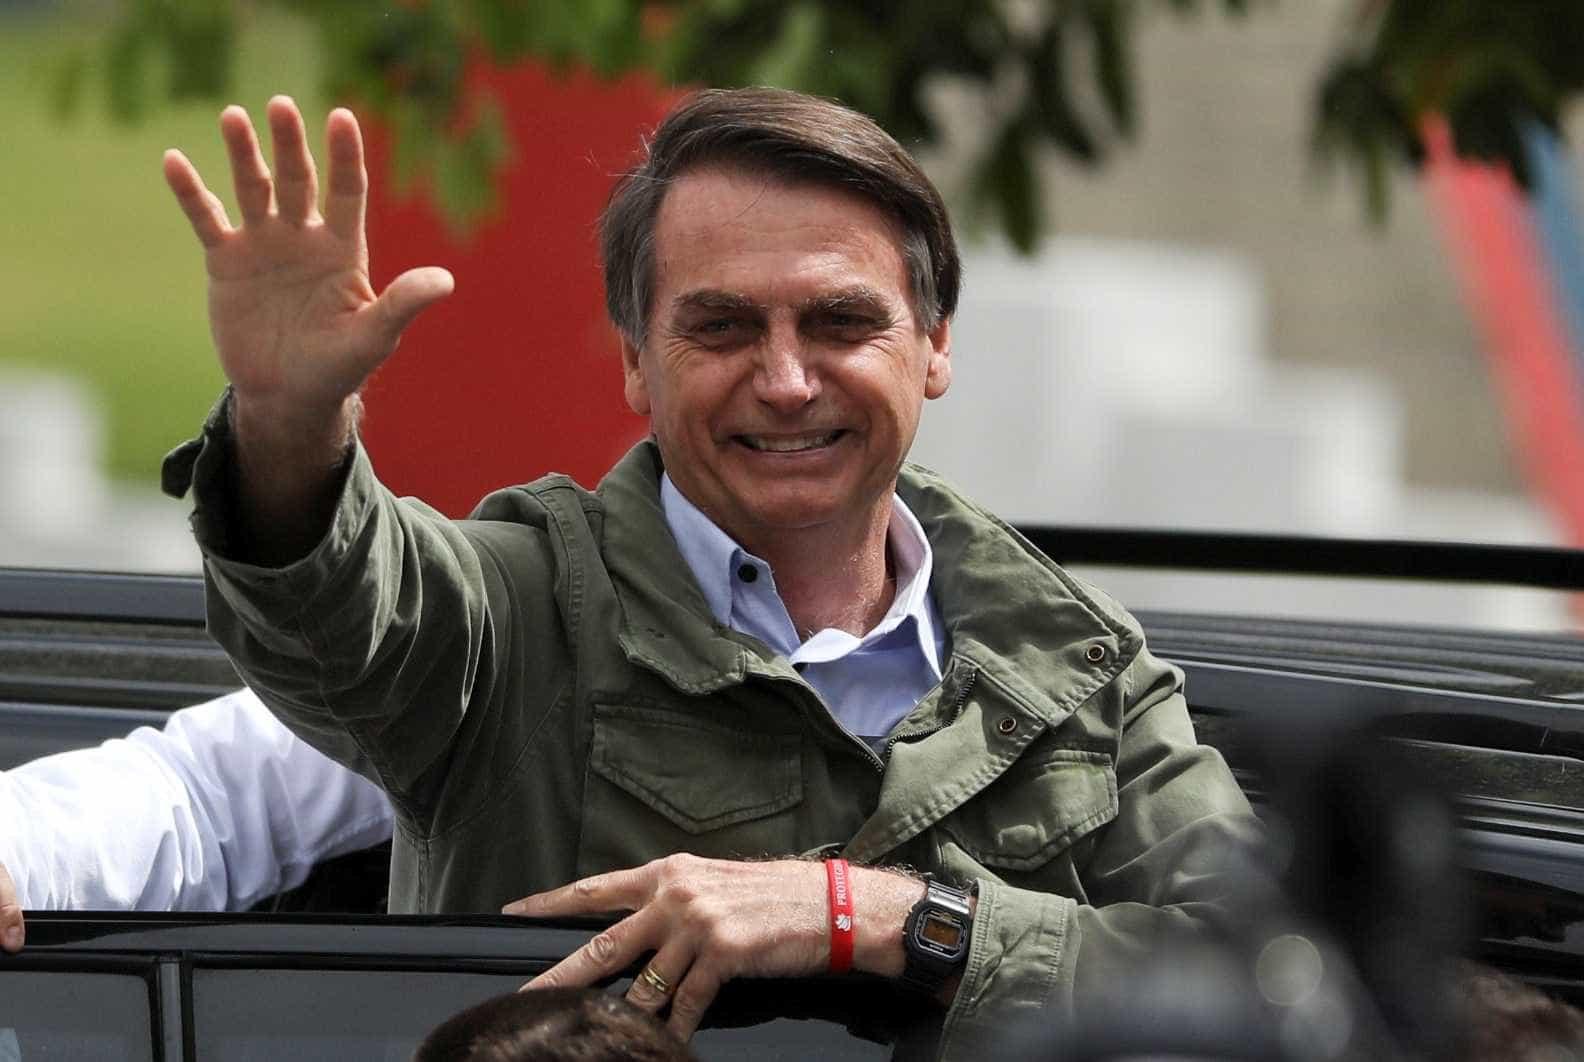 Assessor de Trump elogia Bolsonaro: 'Sinal positivo'